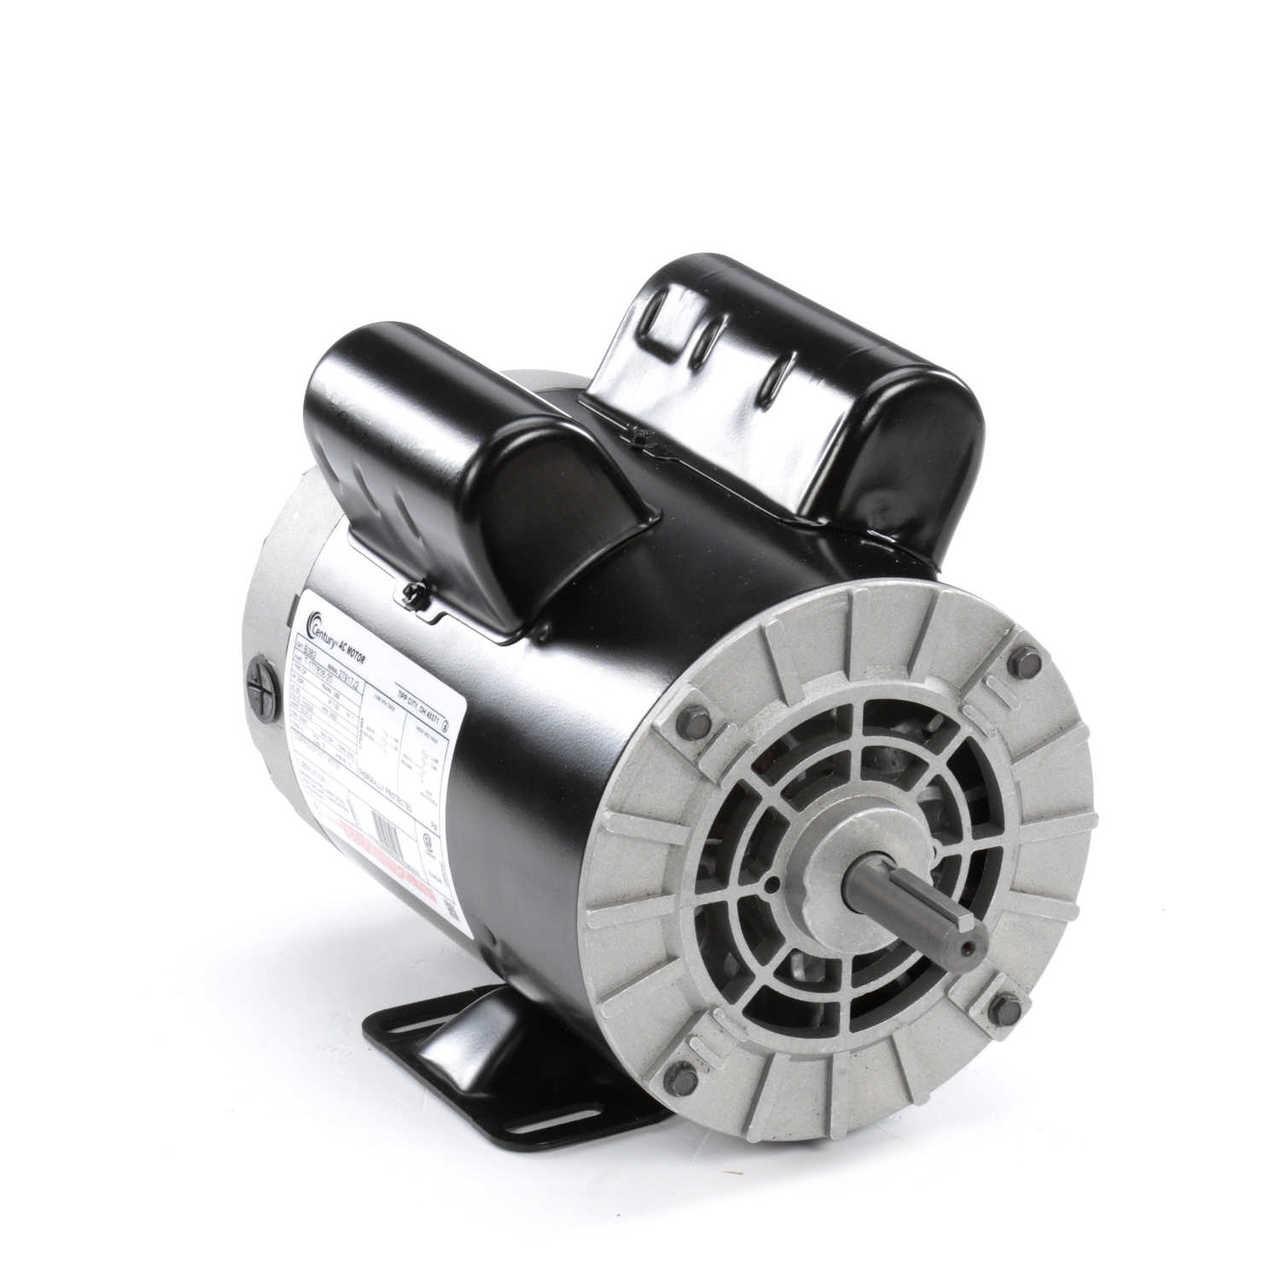 Century Motor # B385 5HP SPL LEESON 56 Frame ELECTRIC MOTOR Replaces Air Compressor Motor